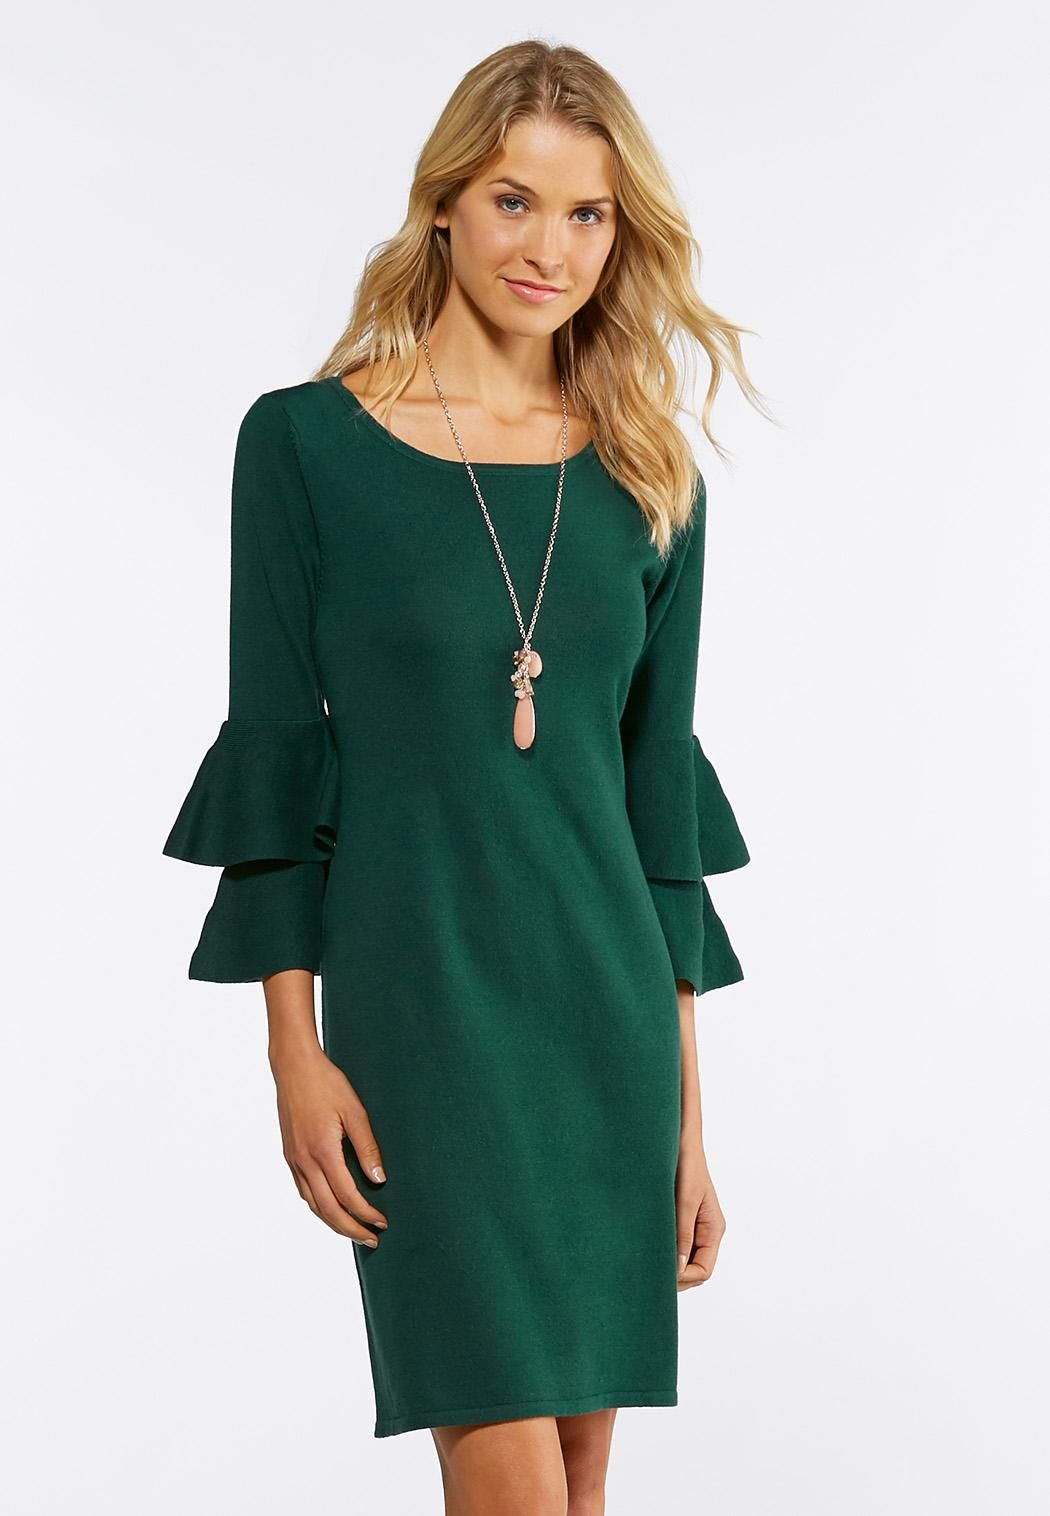 b5eeb8d6597 Double Ruffle Sweater Dress Junior Misses Cato Fashions